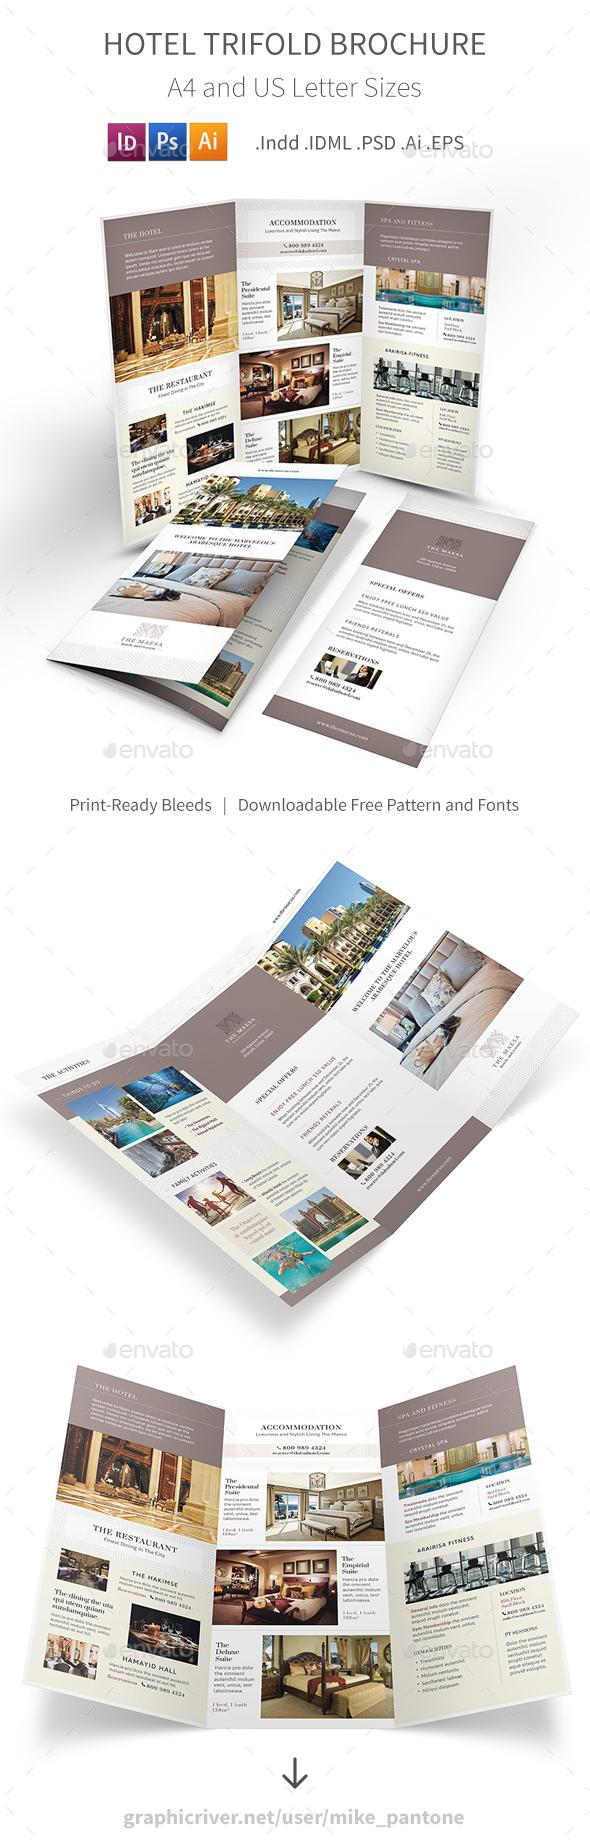 Hotel Trifold Brochure 7 - Informational Brochures